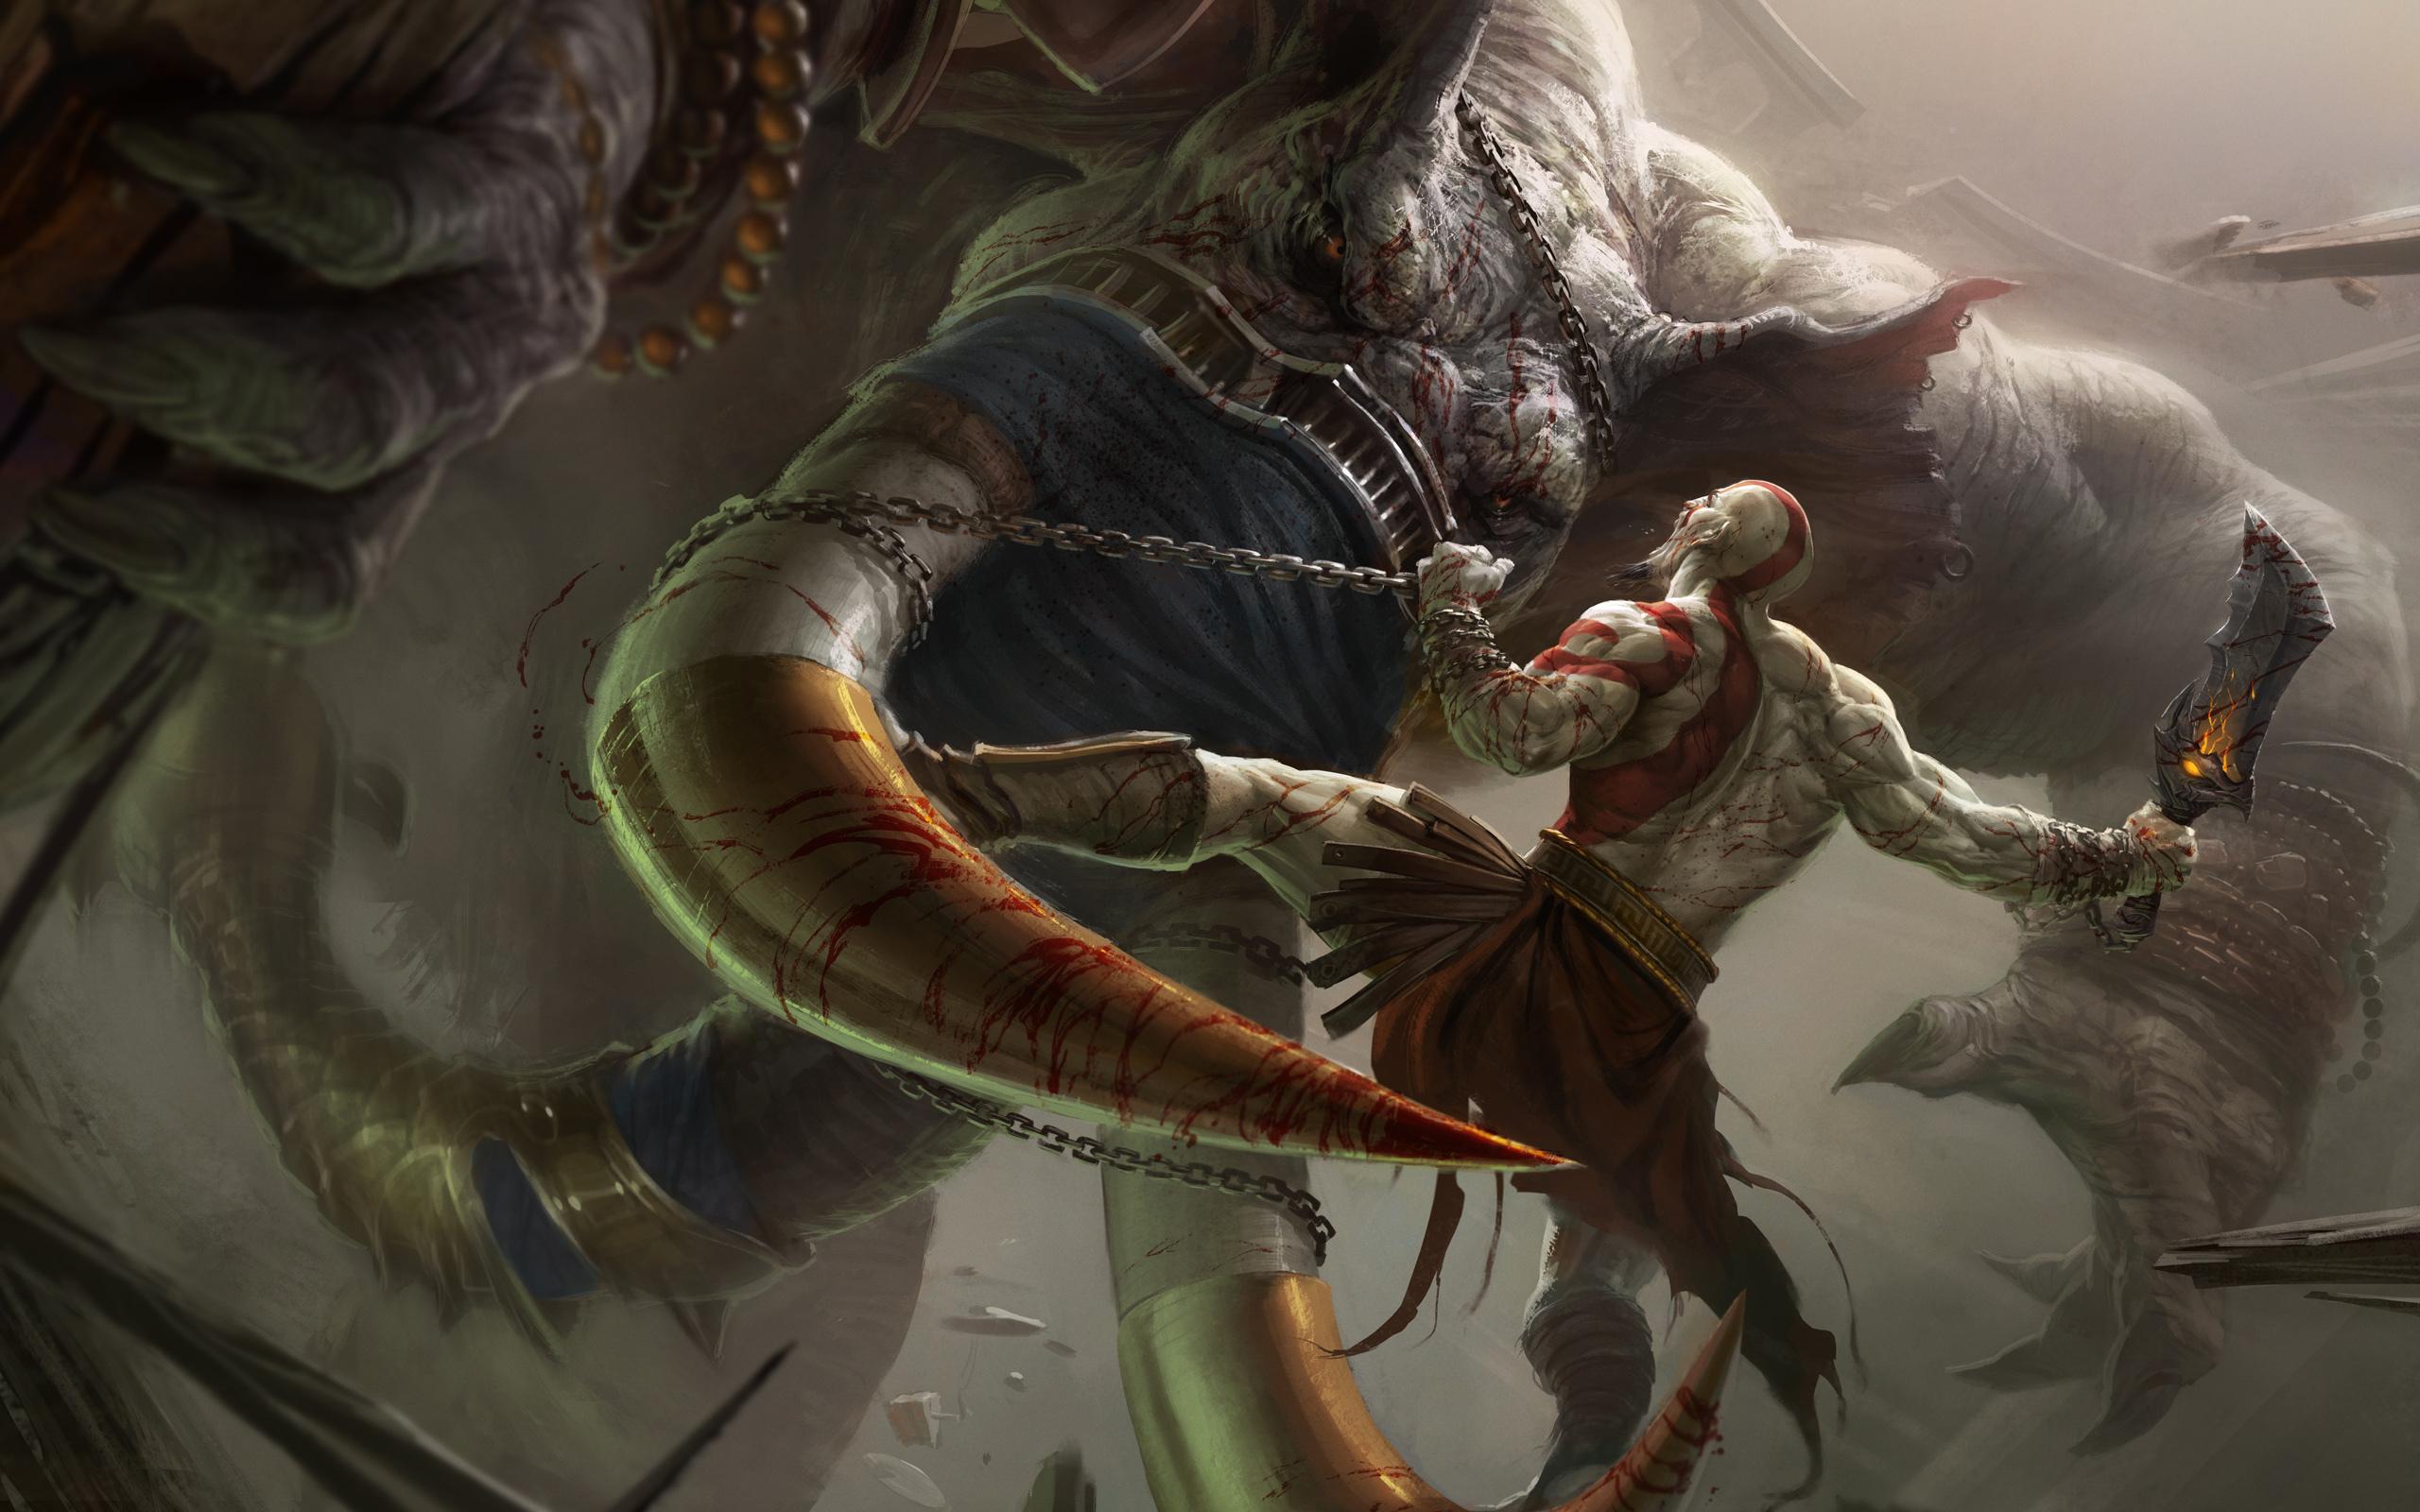 Гнев титанов, монст, Химера  № 1524163 бесплатно